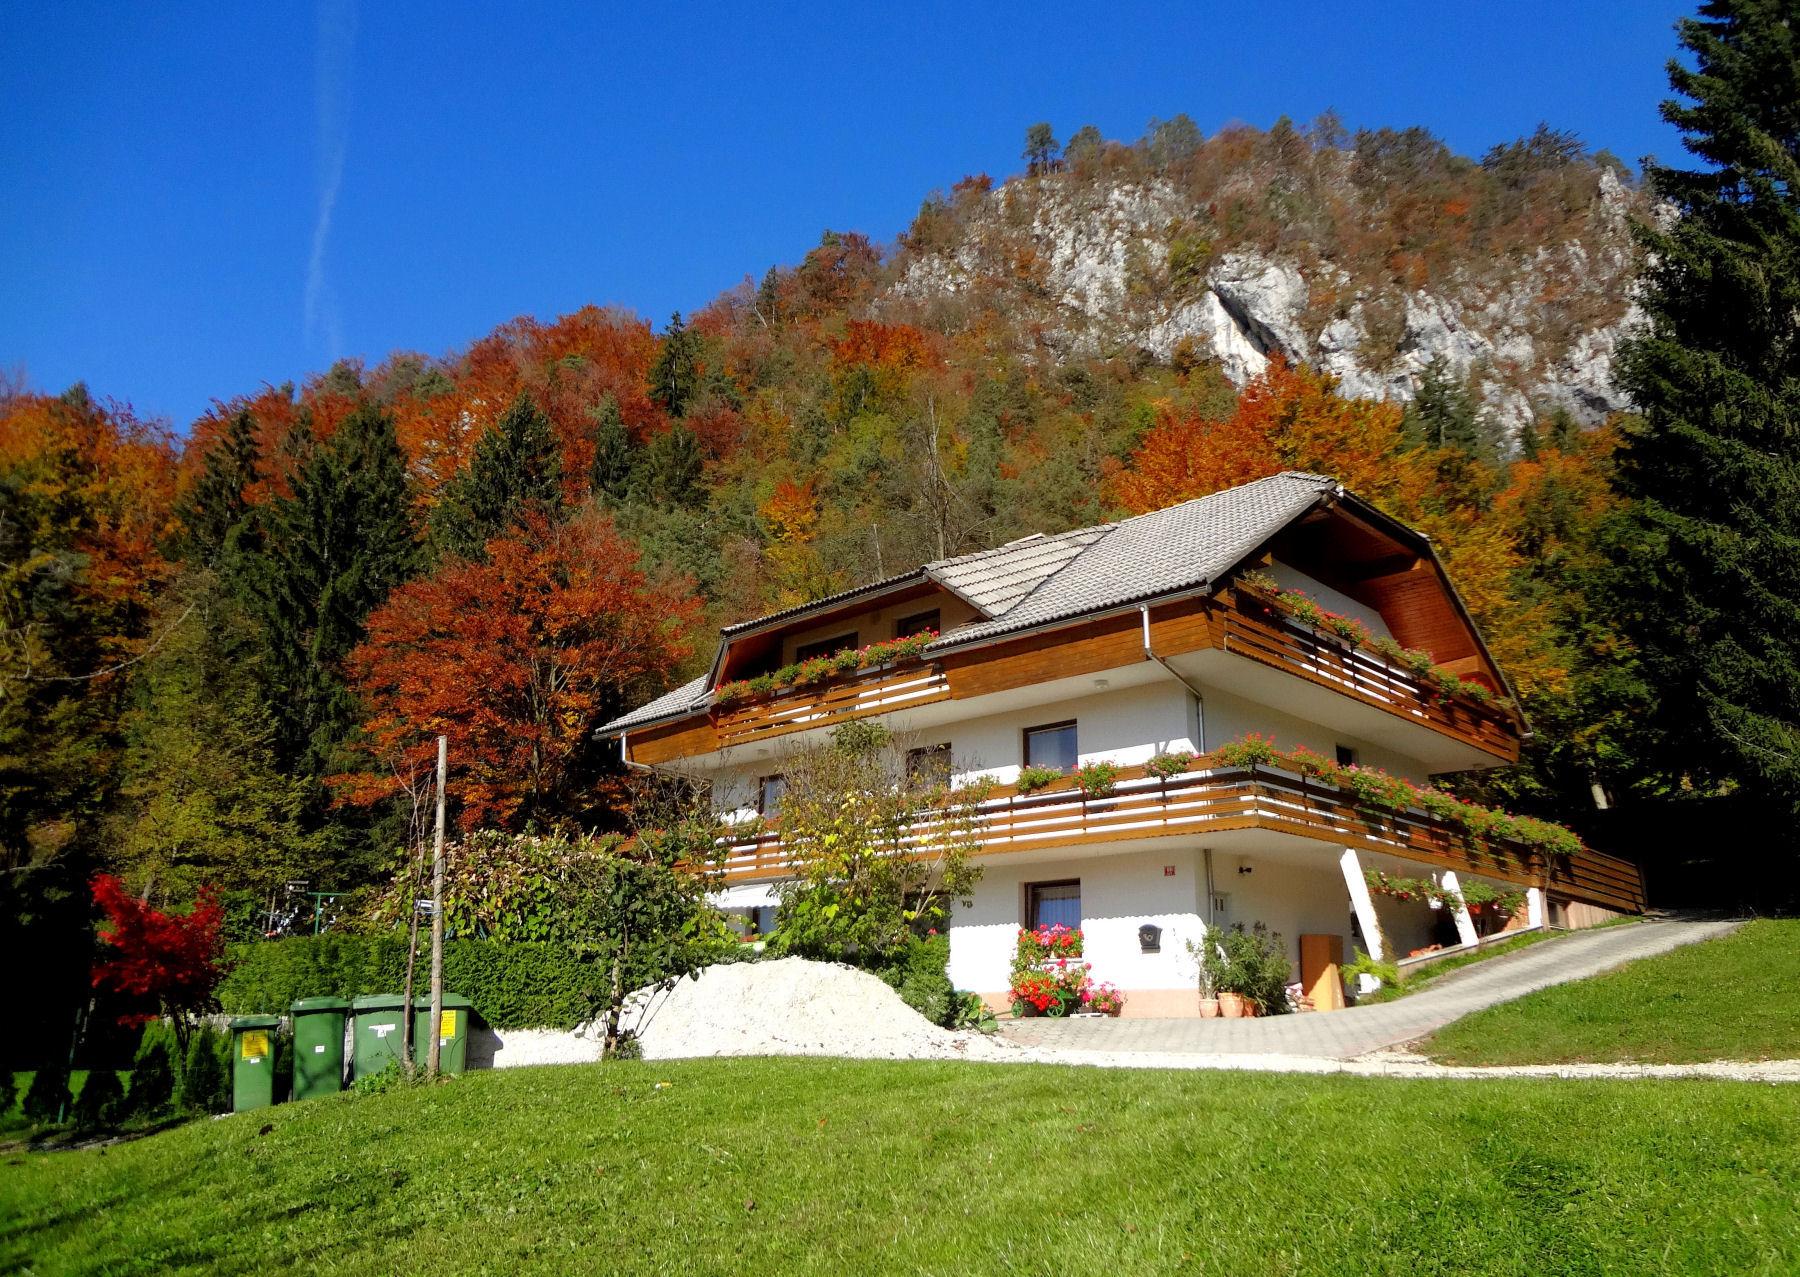 autumn-nature-slovenia-001